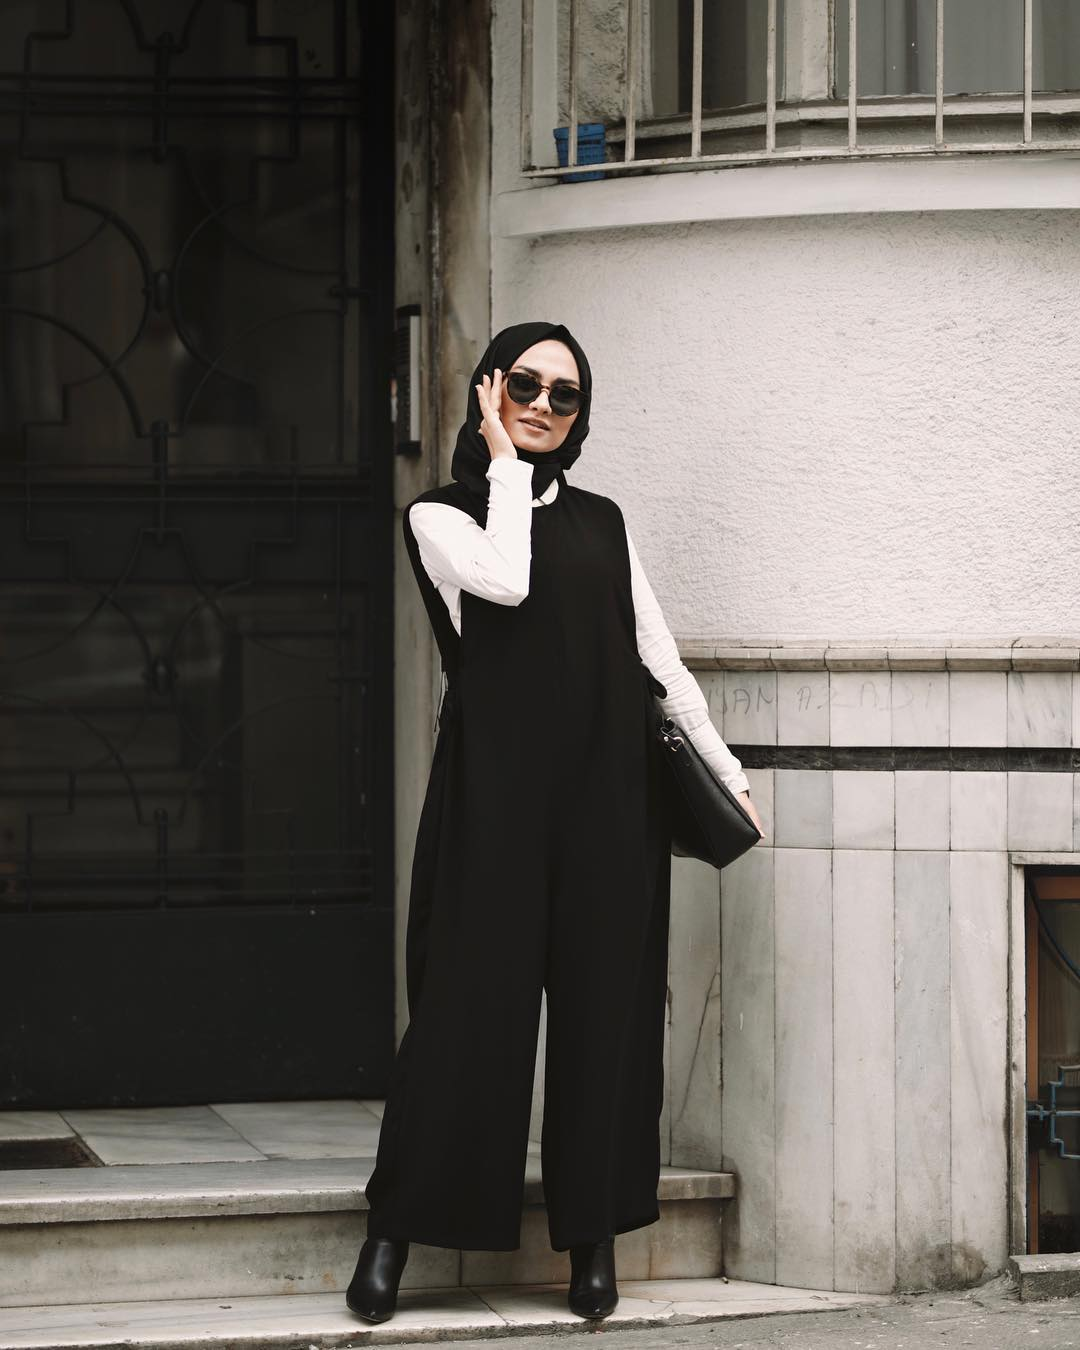 Stylish Hijab Work Wear Outfit Ideas via @Pelin_sarkaya